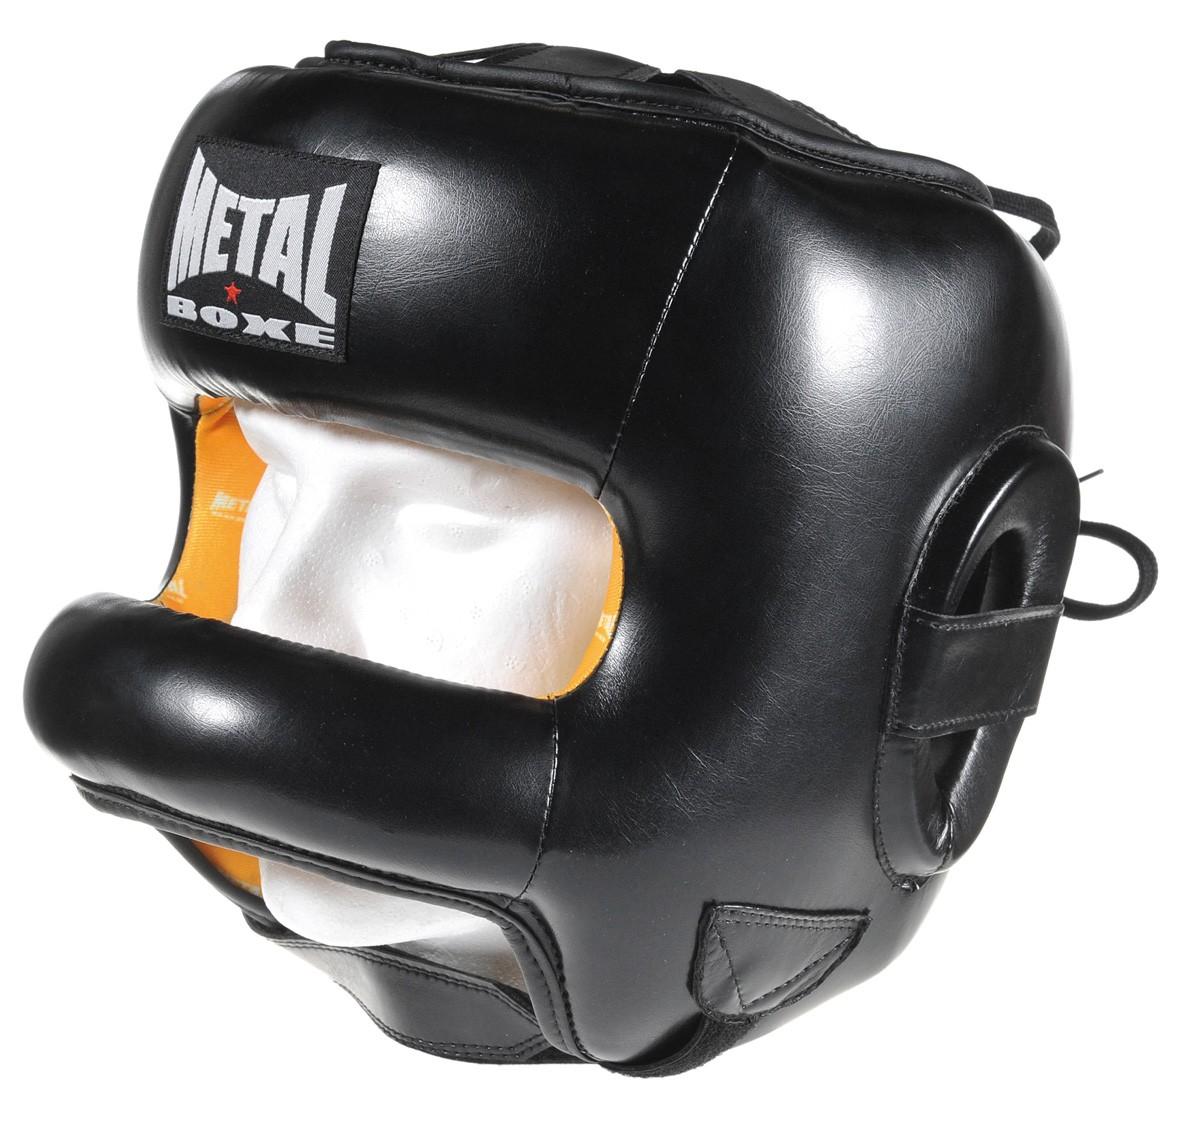 casque de boxe avec barre